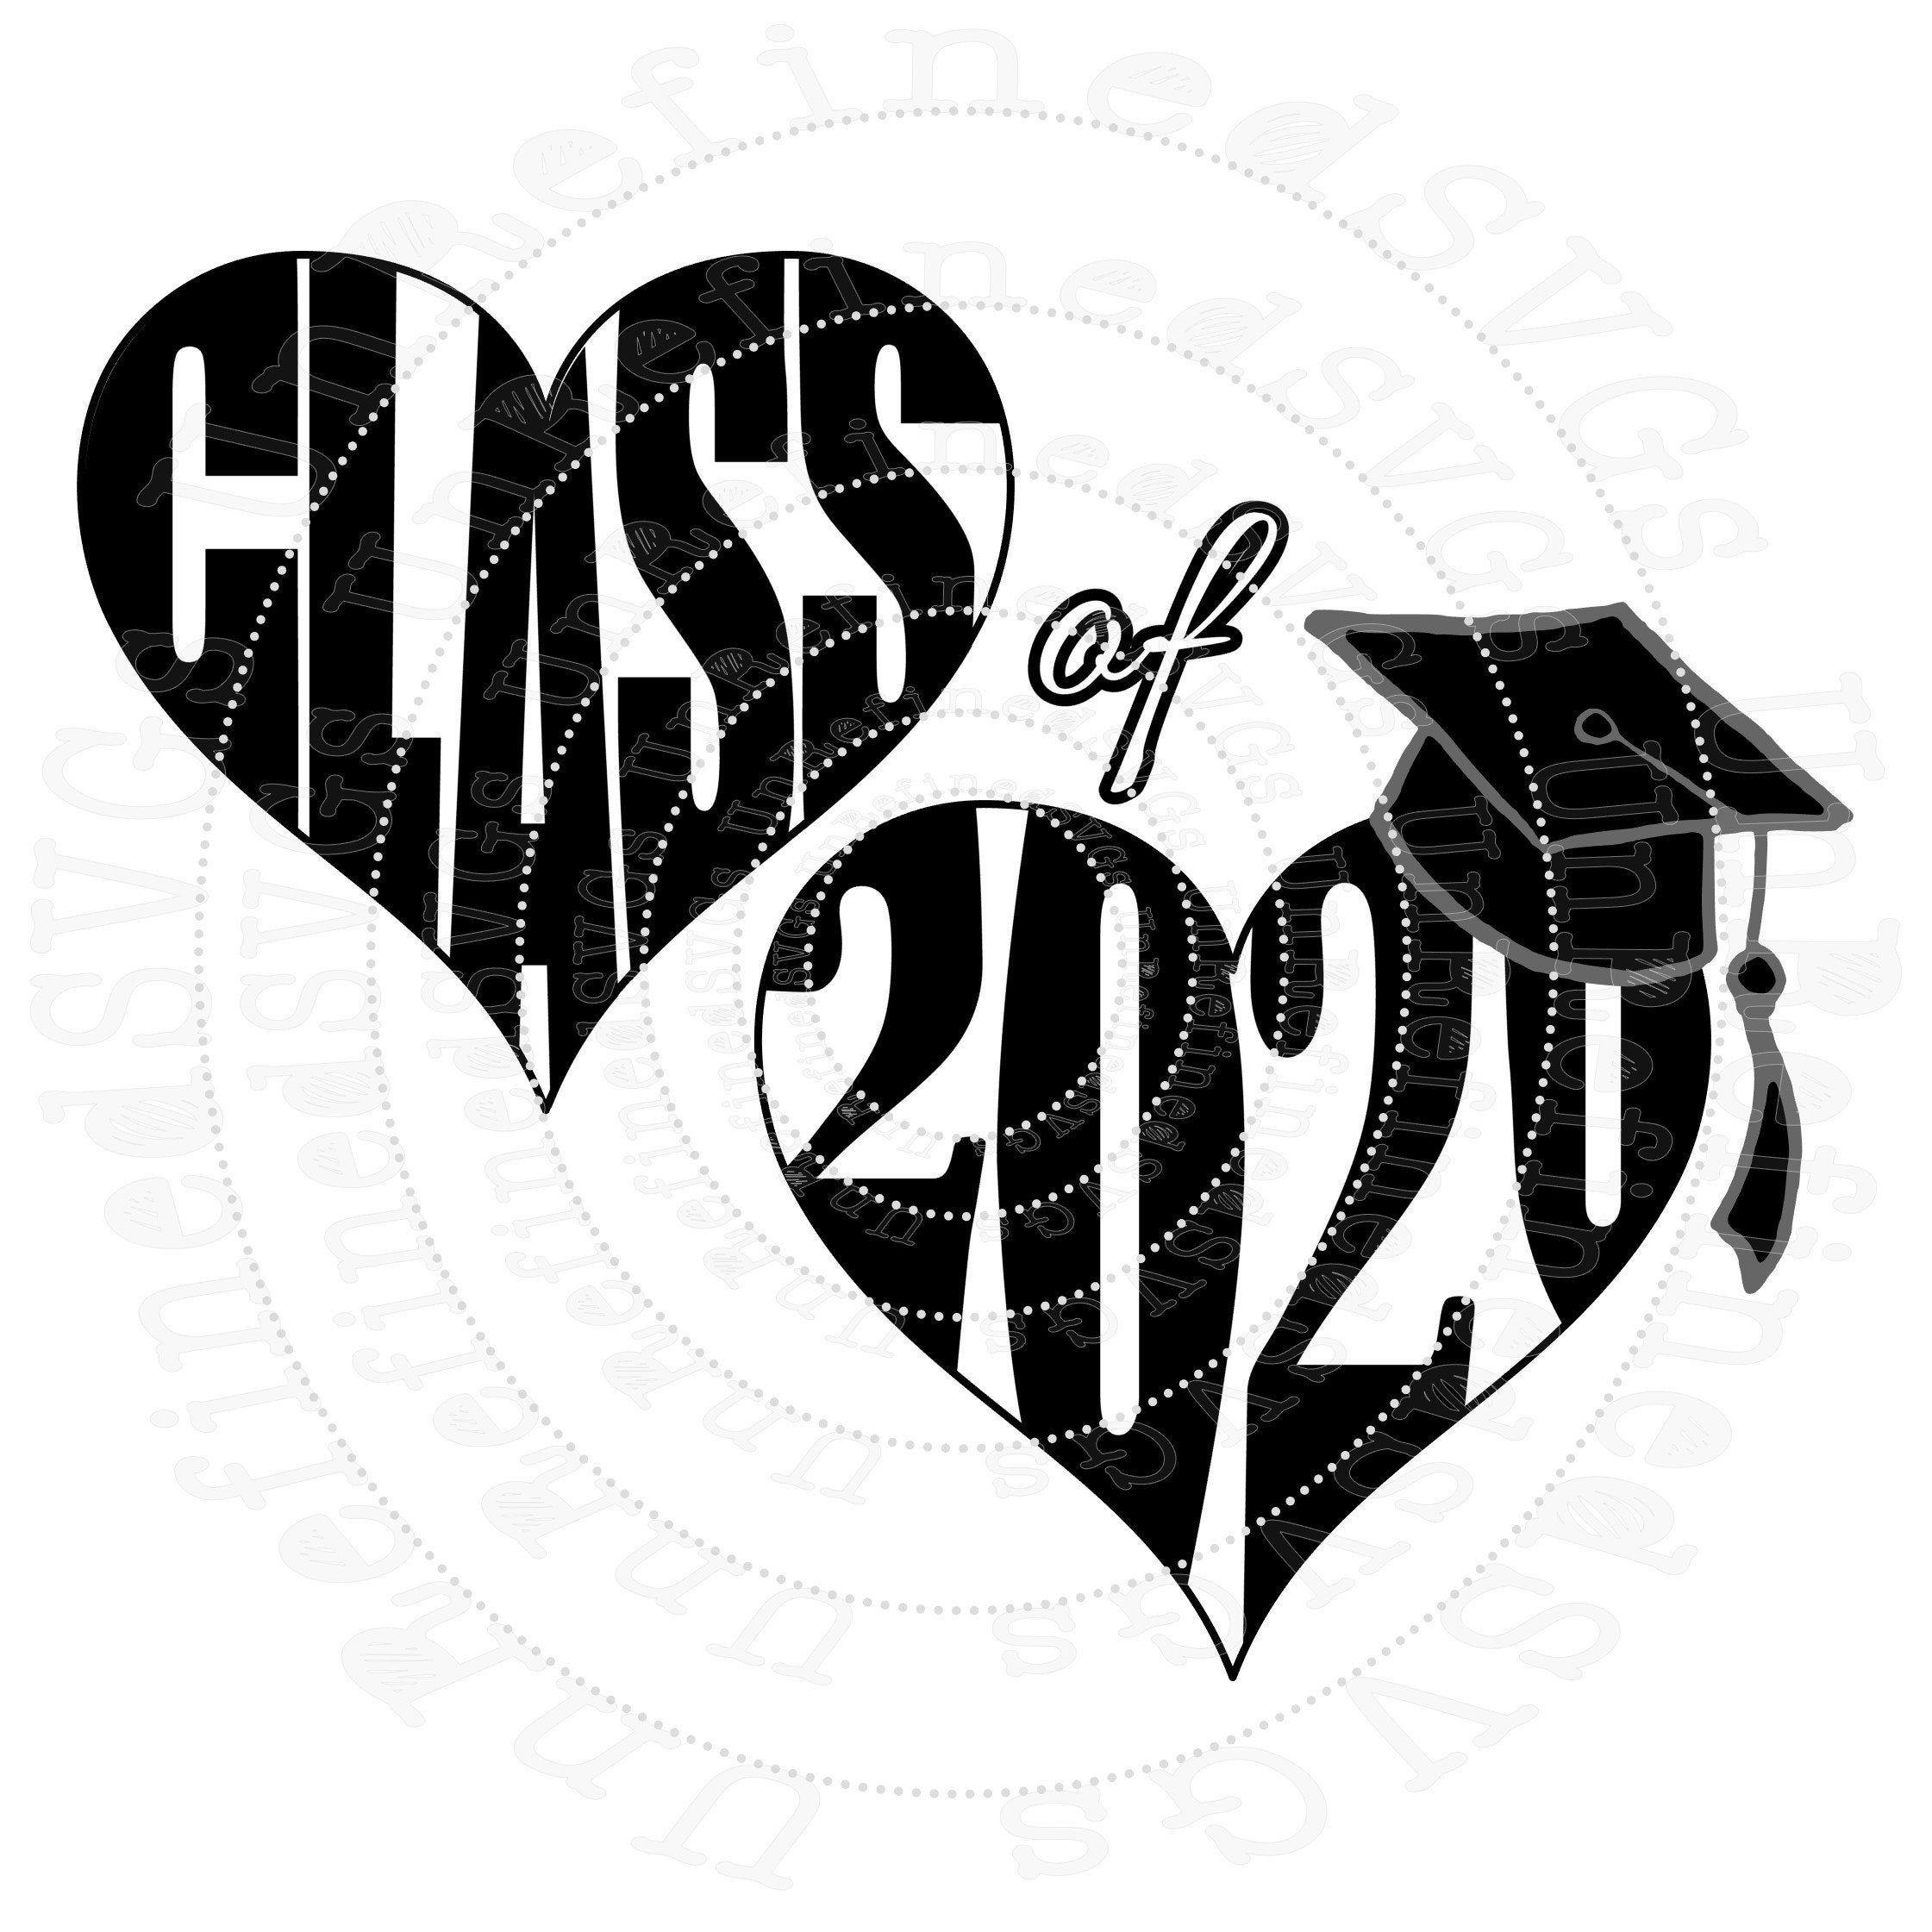 Kindergarten Class of 2021 SVG Crayon SVG Back to School